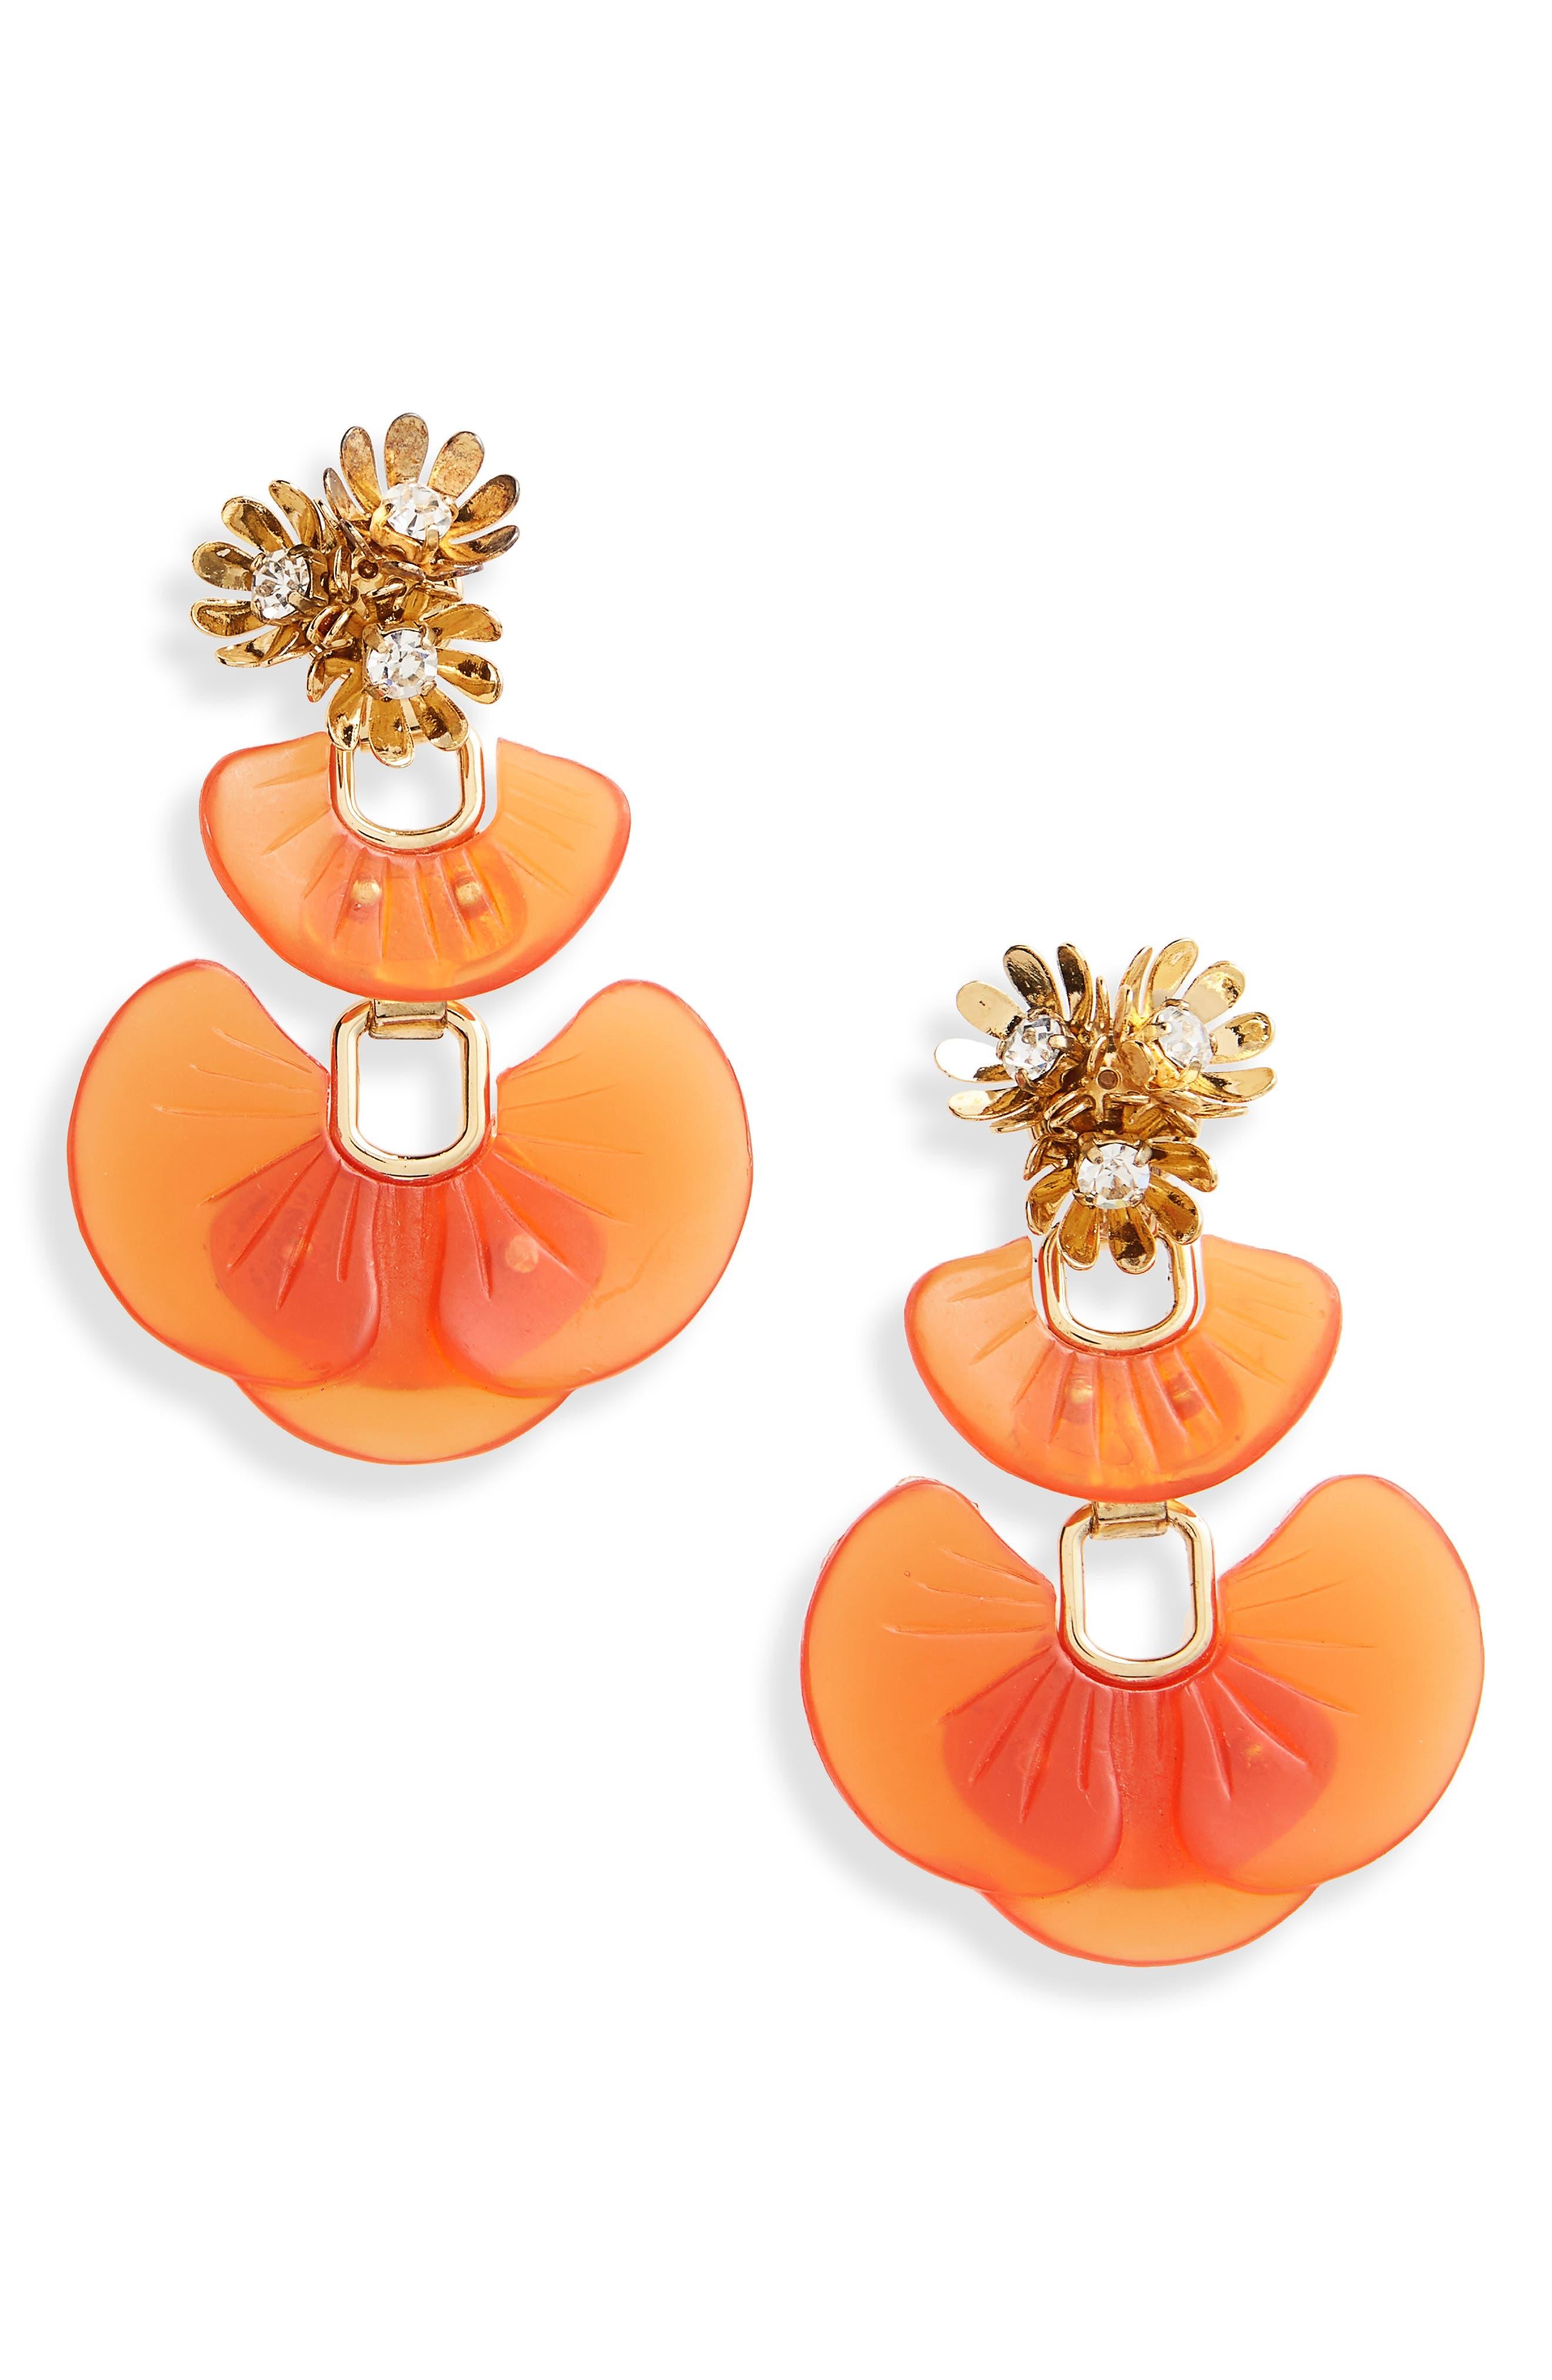 Island Drop Earrings,                         Main,                         color, Amber